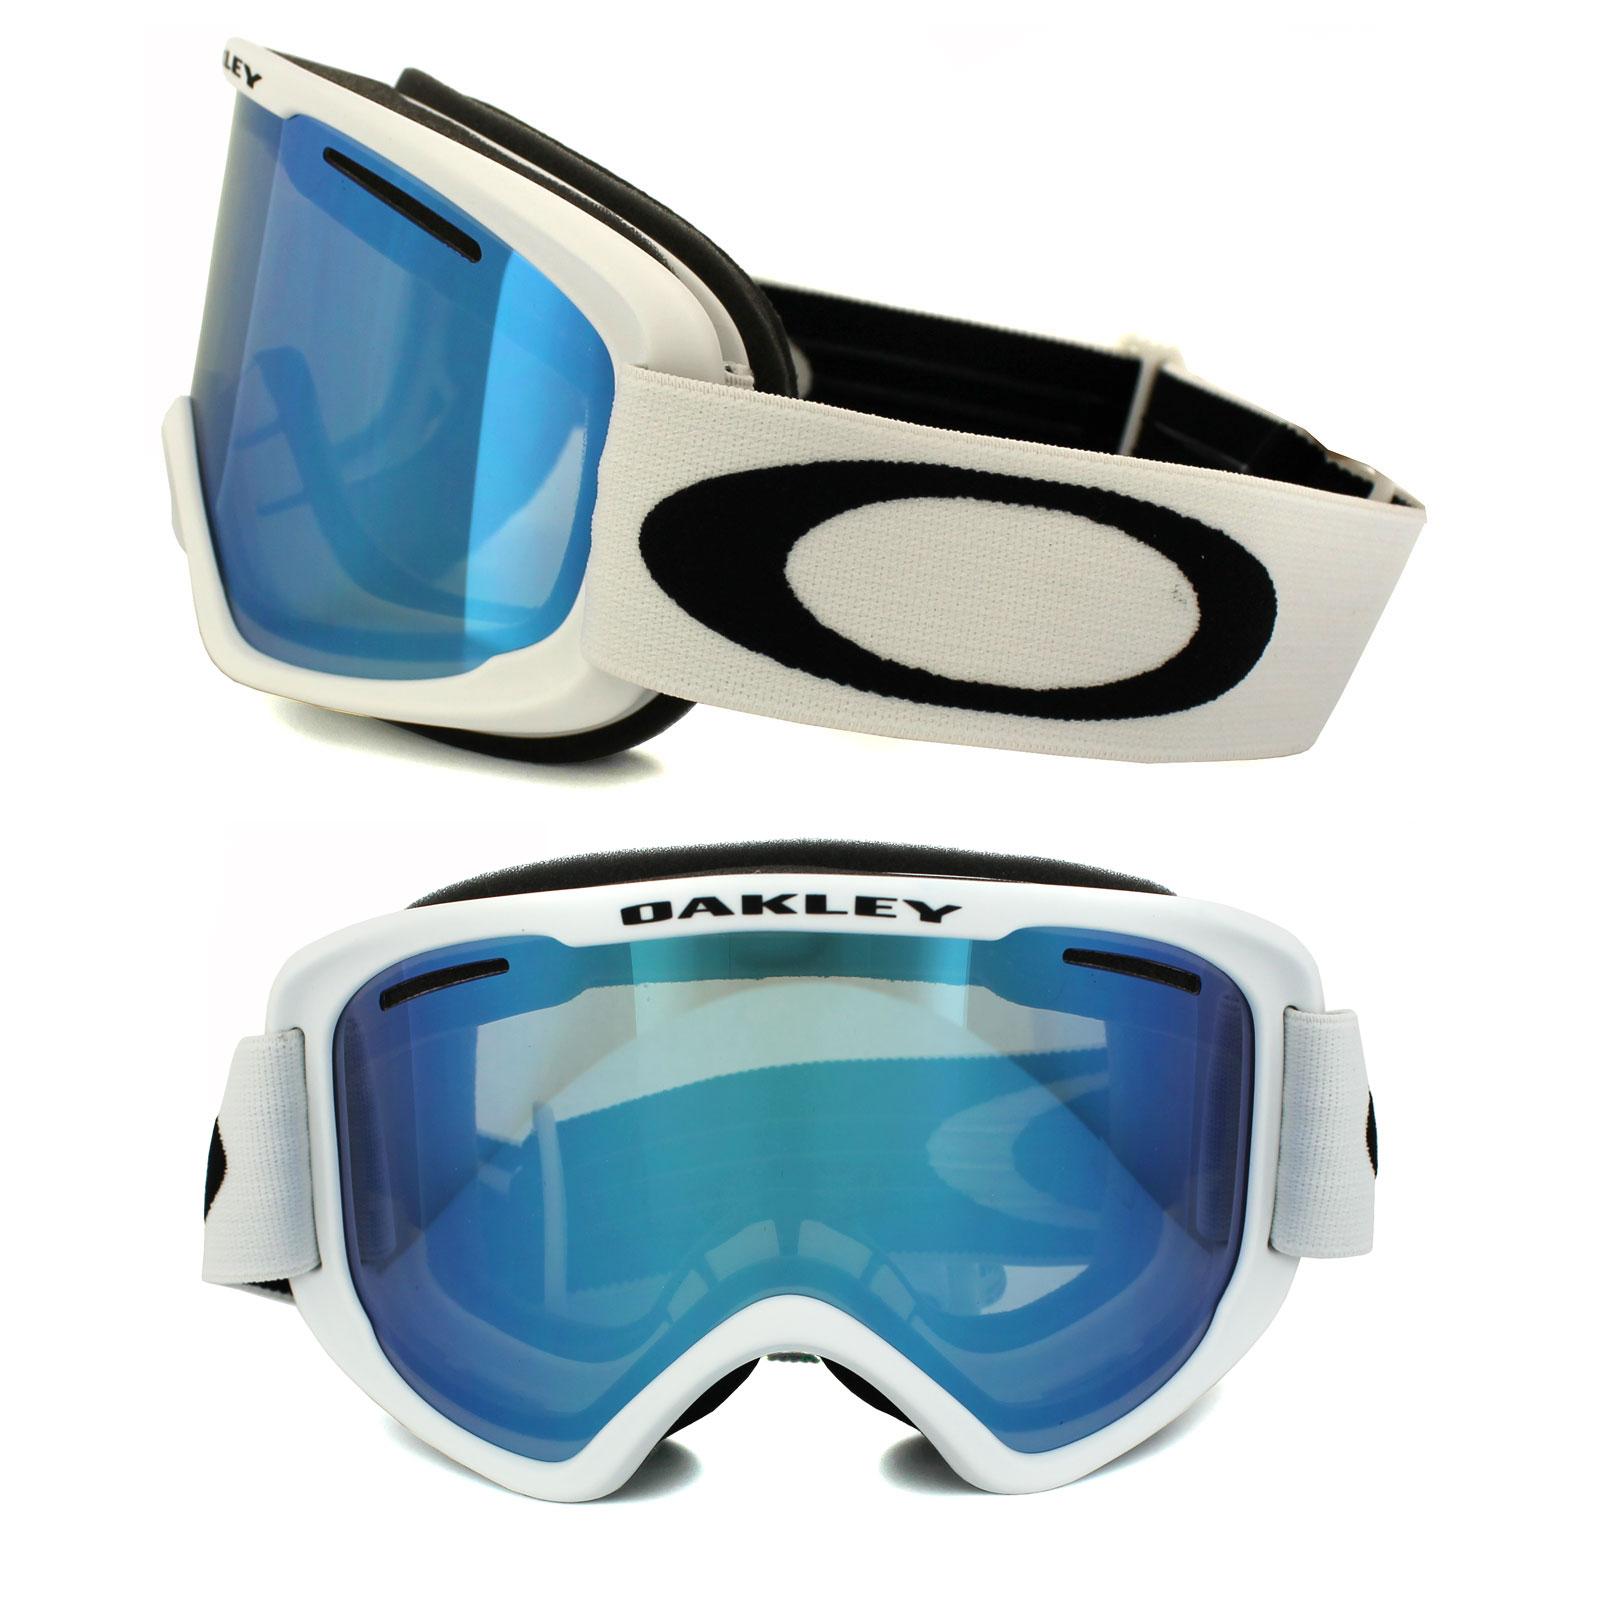 642430fdef3a Oakley 02 Xm Snow Goggle